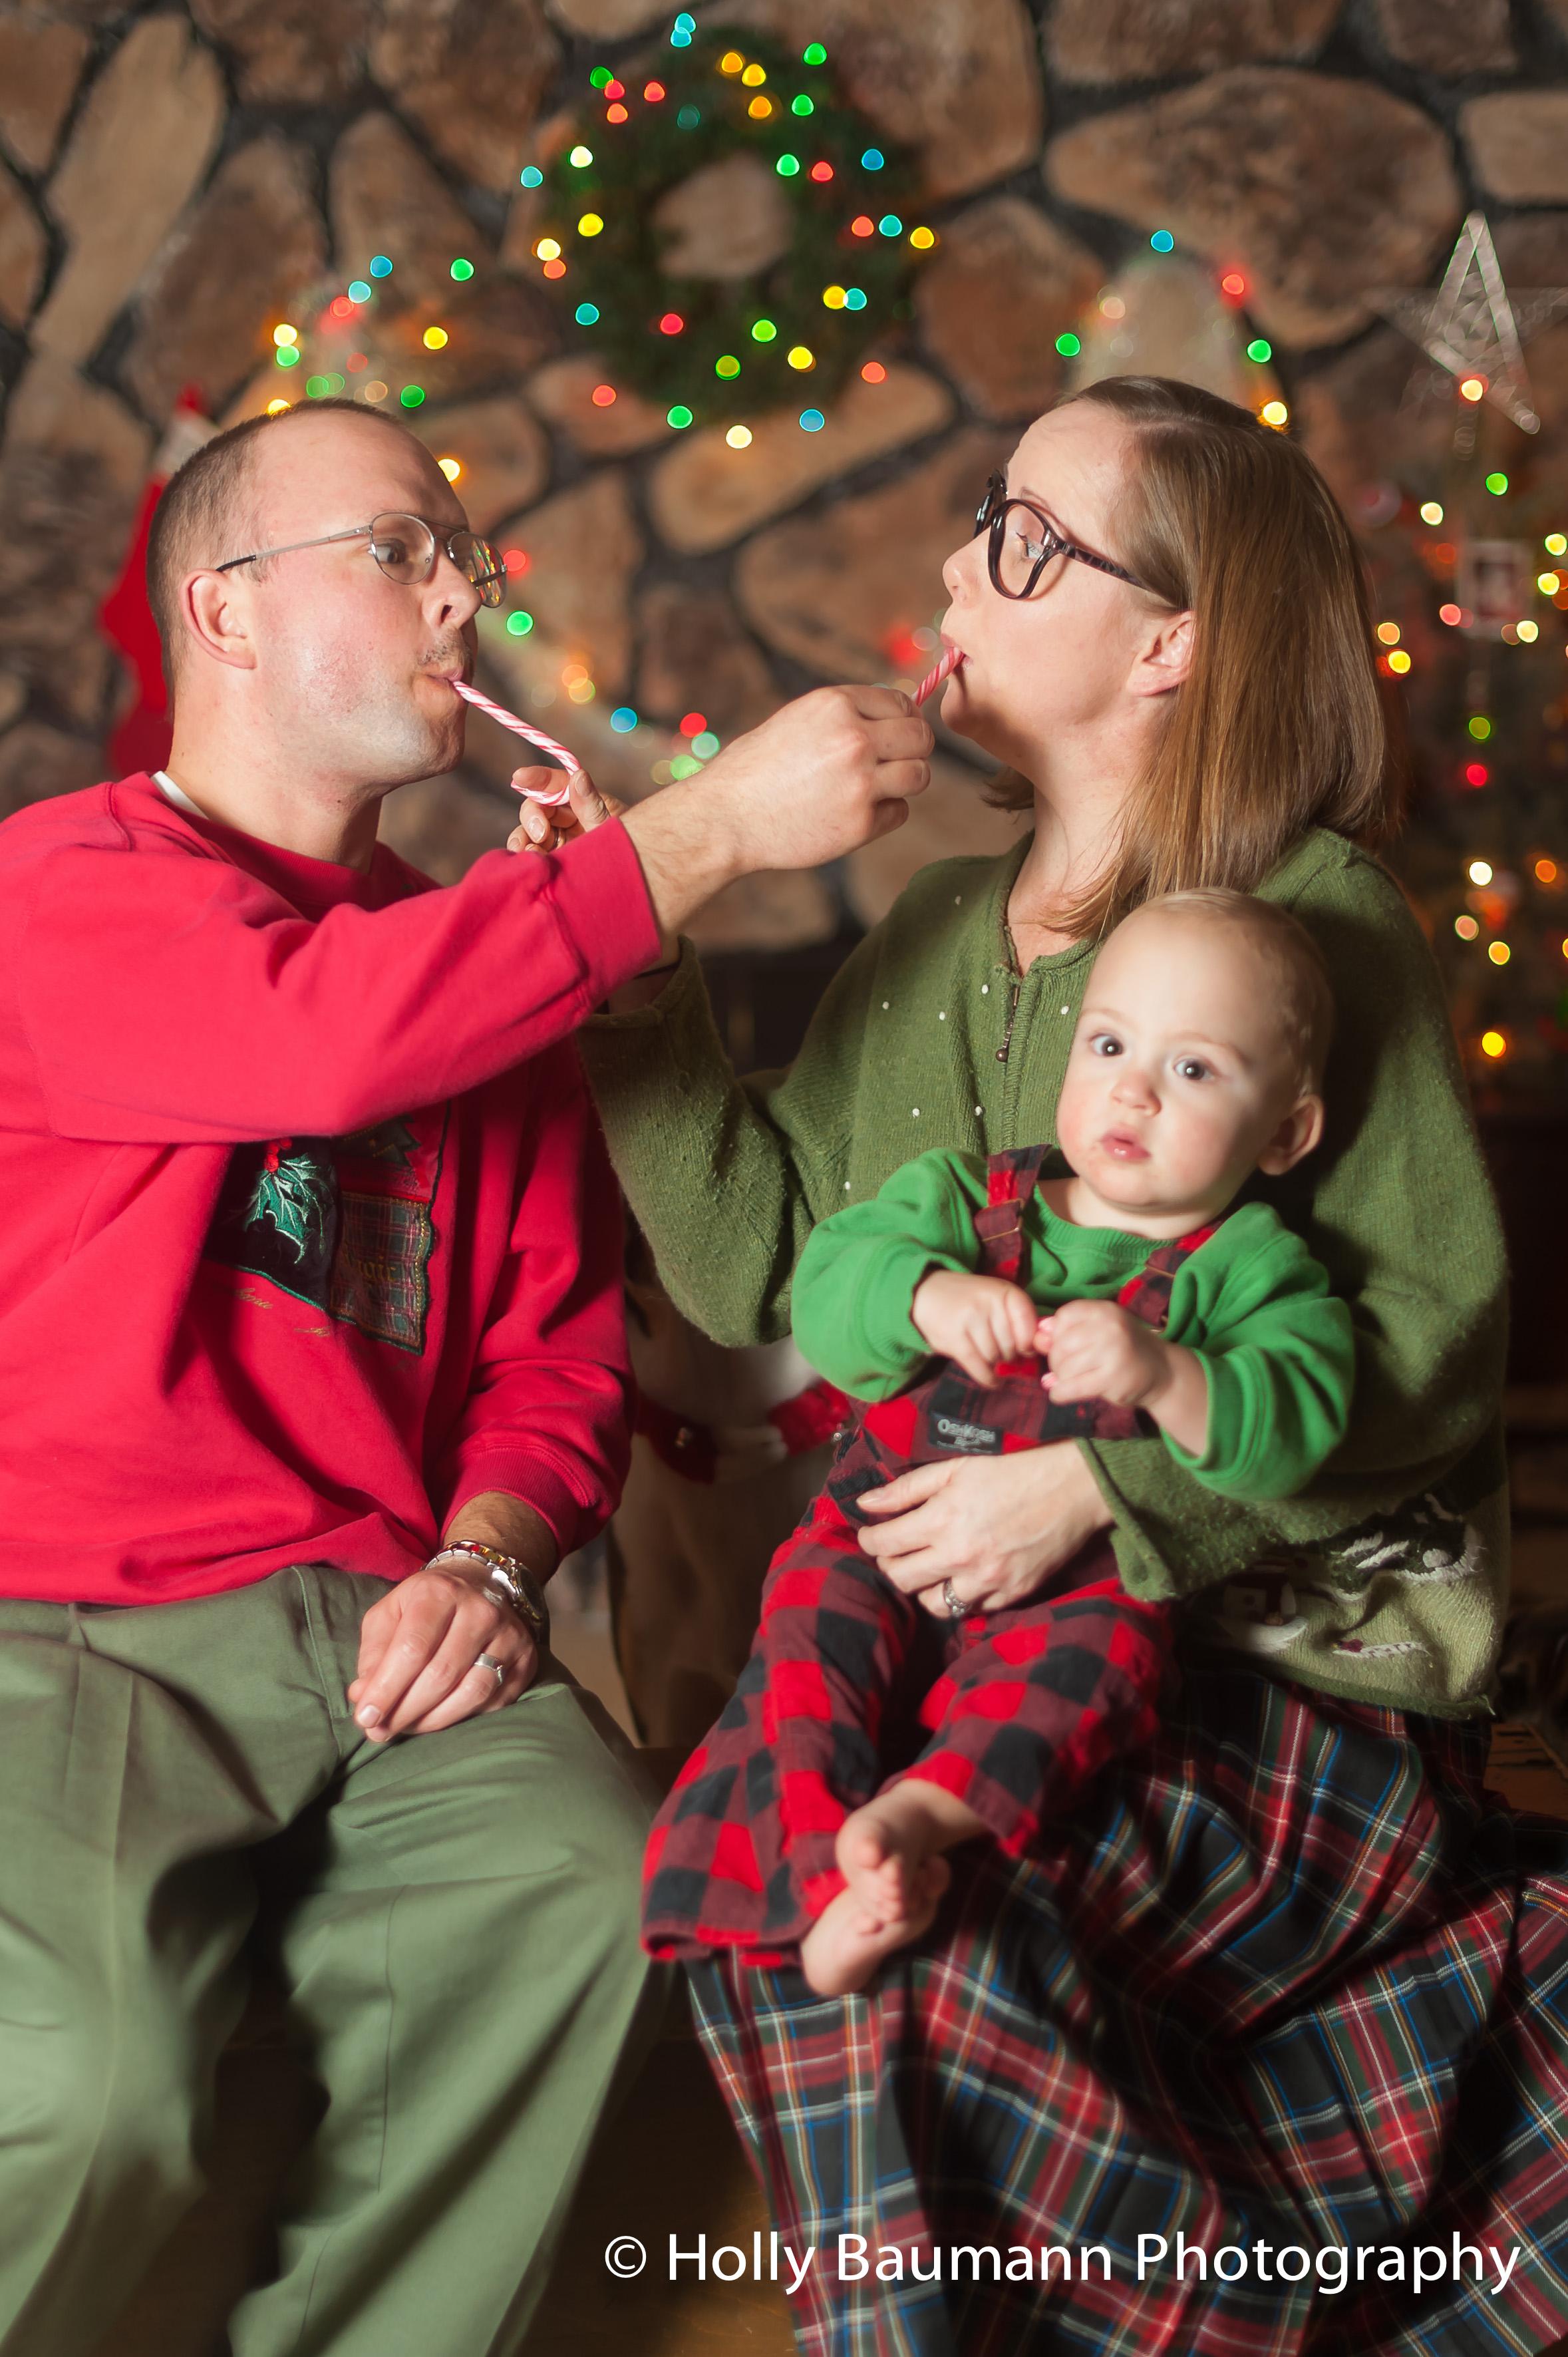 How To Make A Tacky Family Christmas Card Bloomington